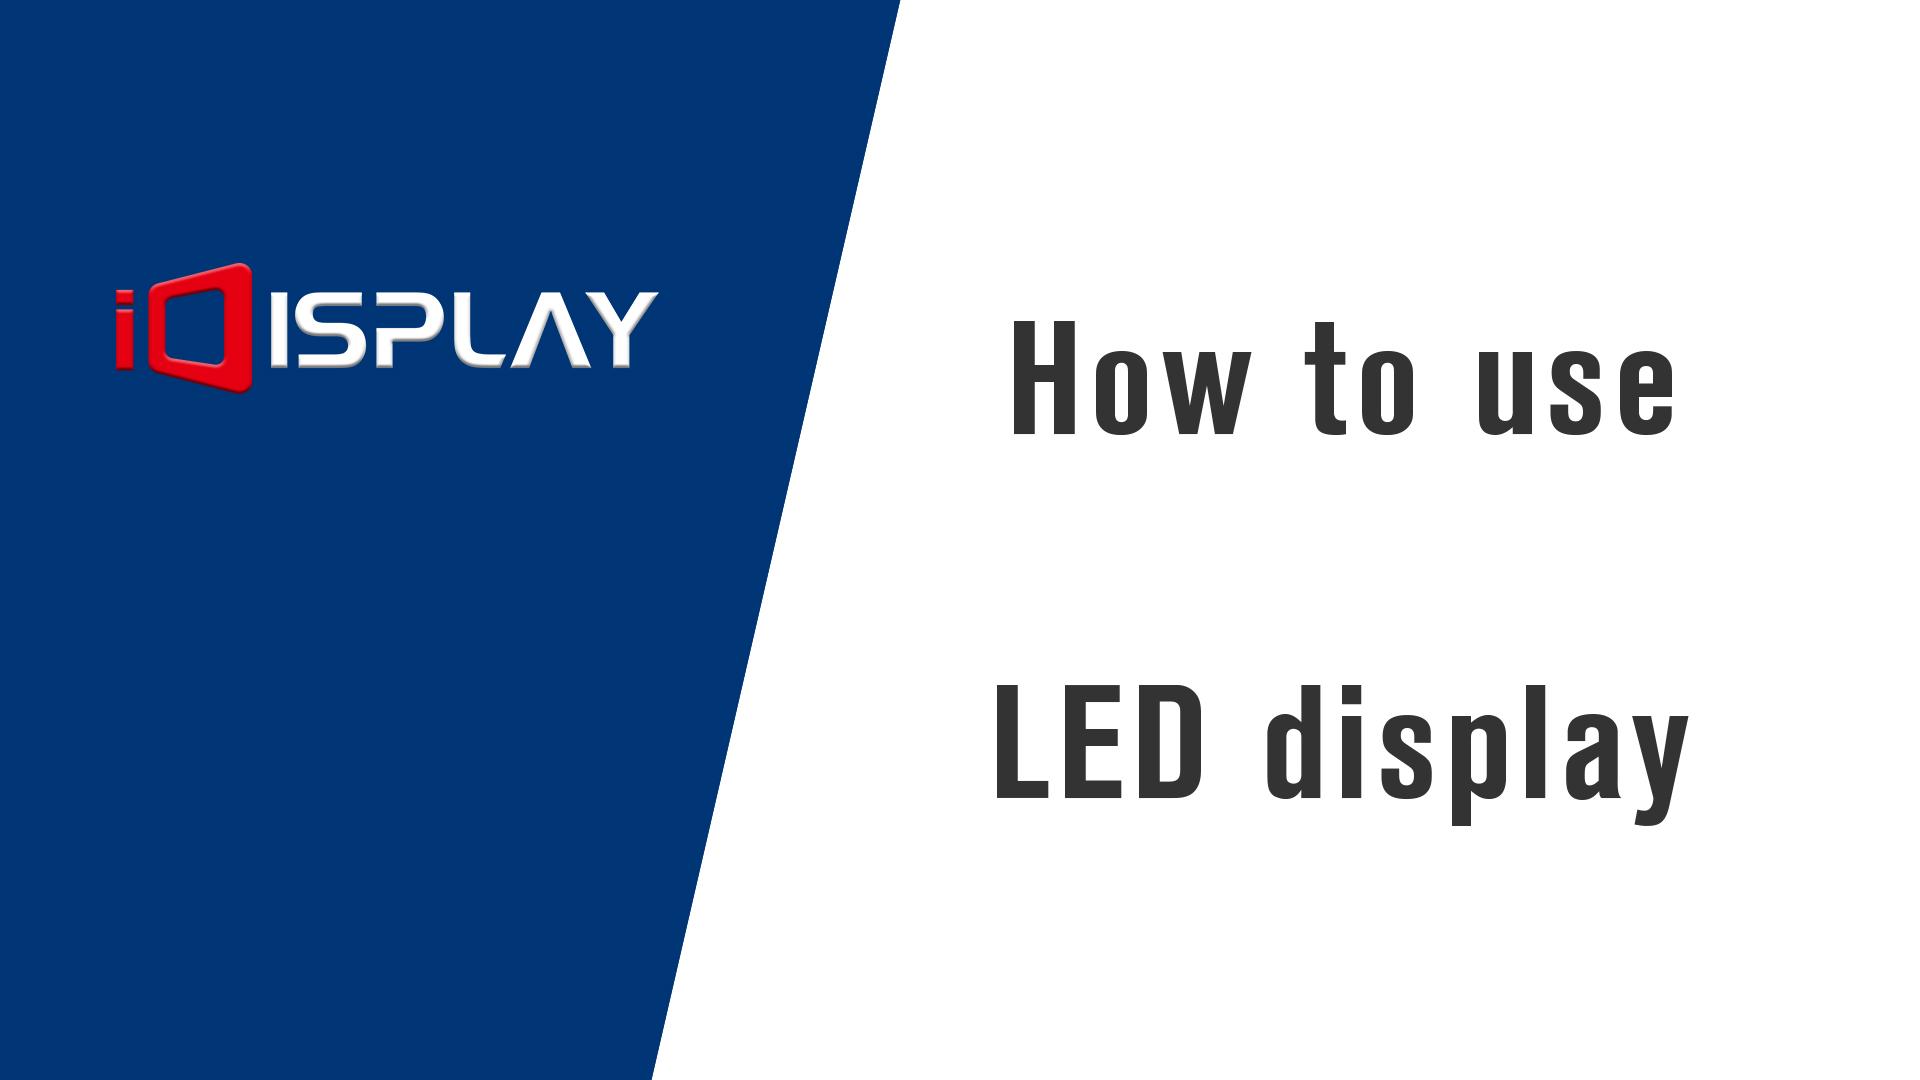 Hoe software van led-display te gebruiken - Shenzhen iDisplay Technology Co., Ltd